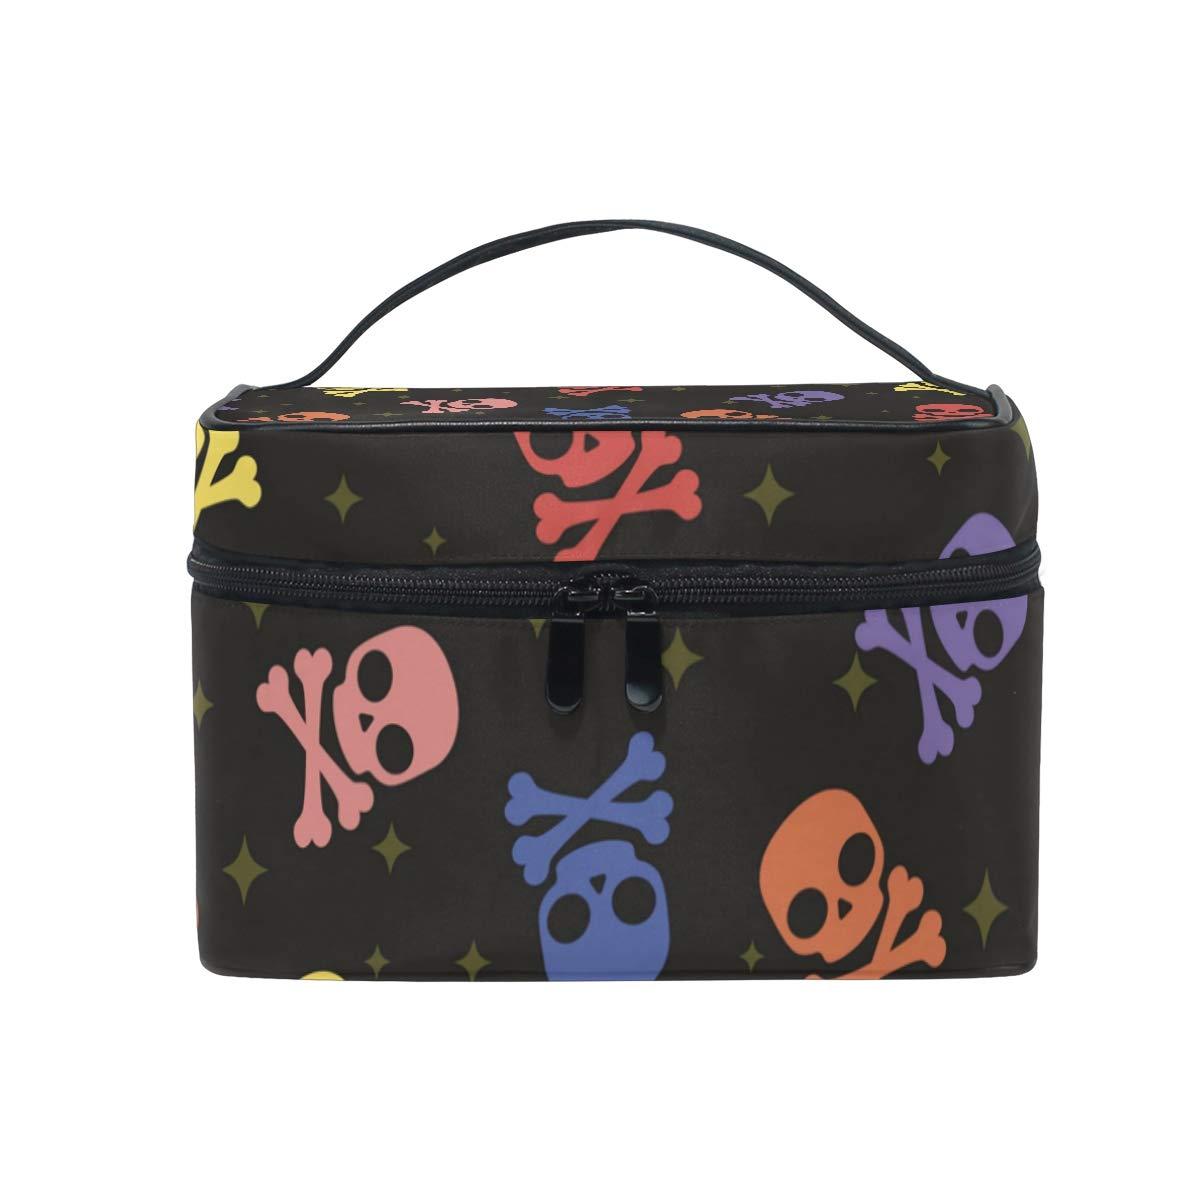 Large Travel Makeup Train Case Skull Colorful Carrying Portable Zip Cosmetic Brush Bag Makeup Bag Organizer for Girls Women